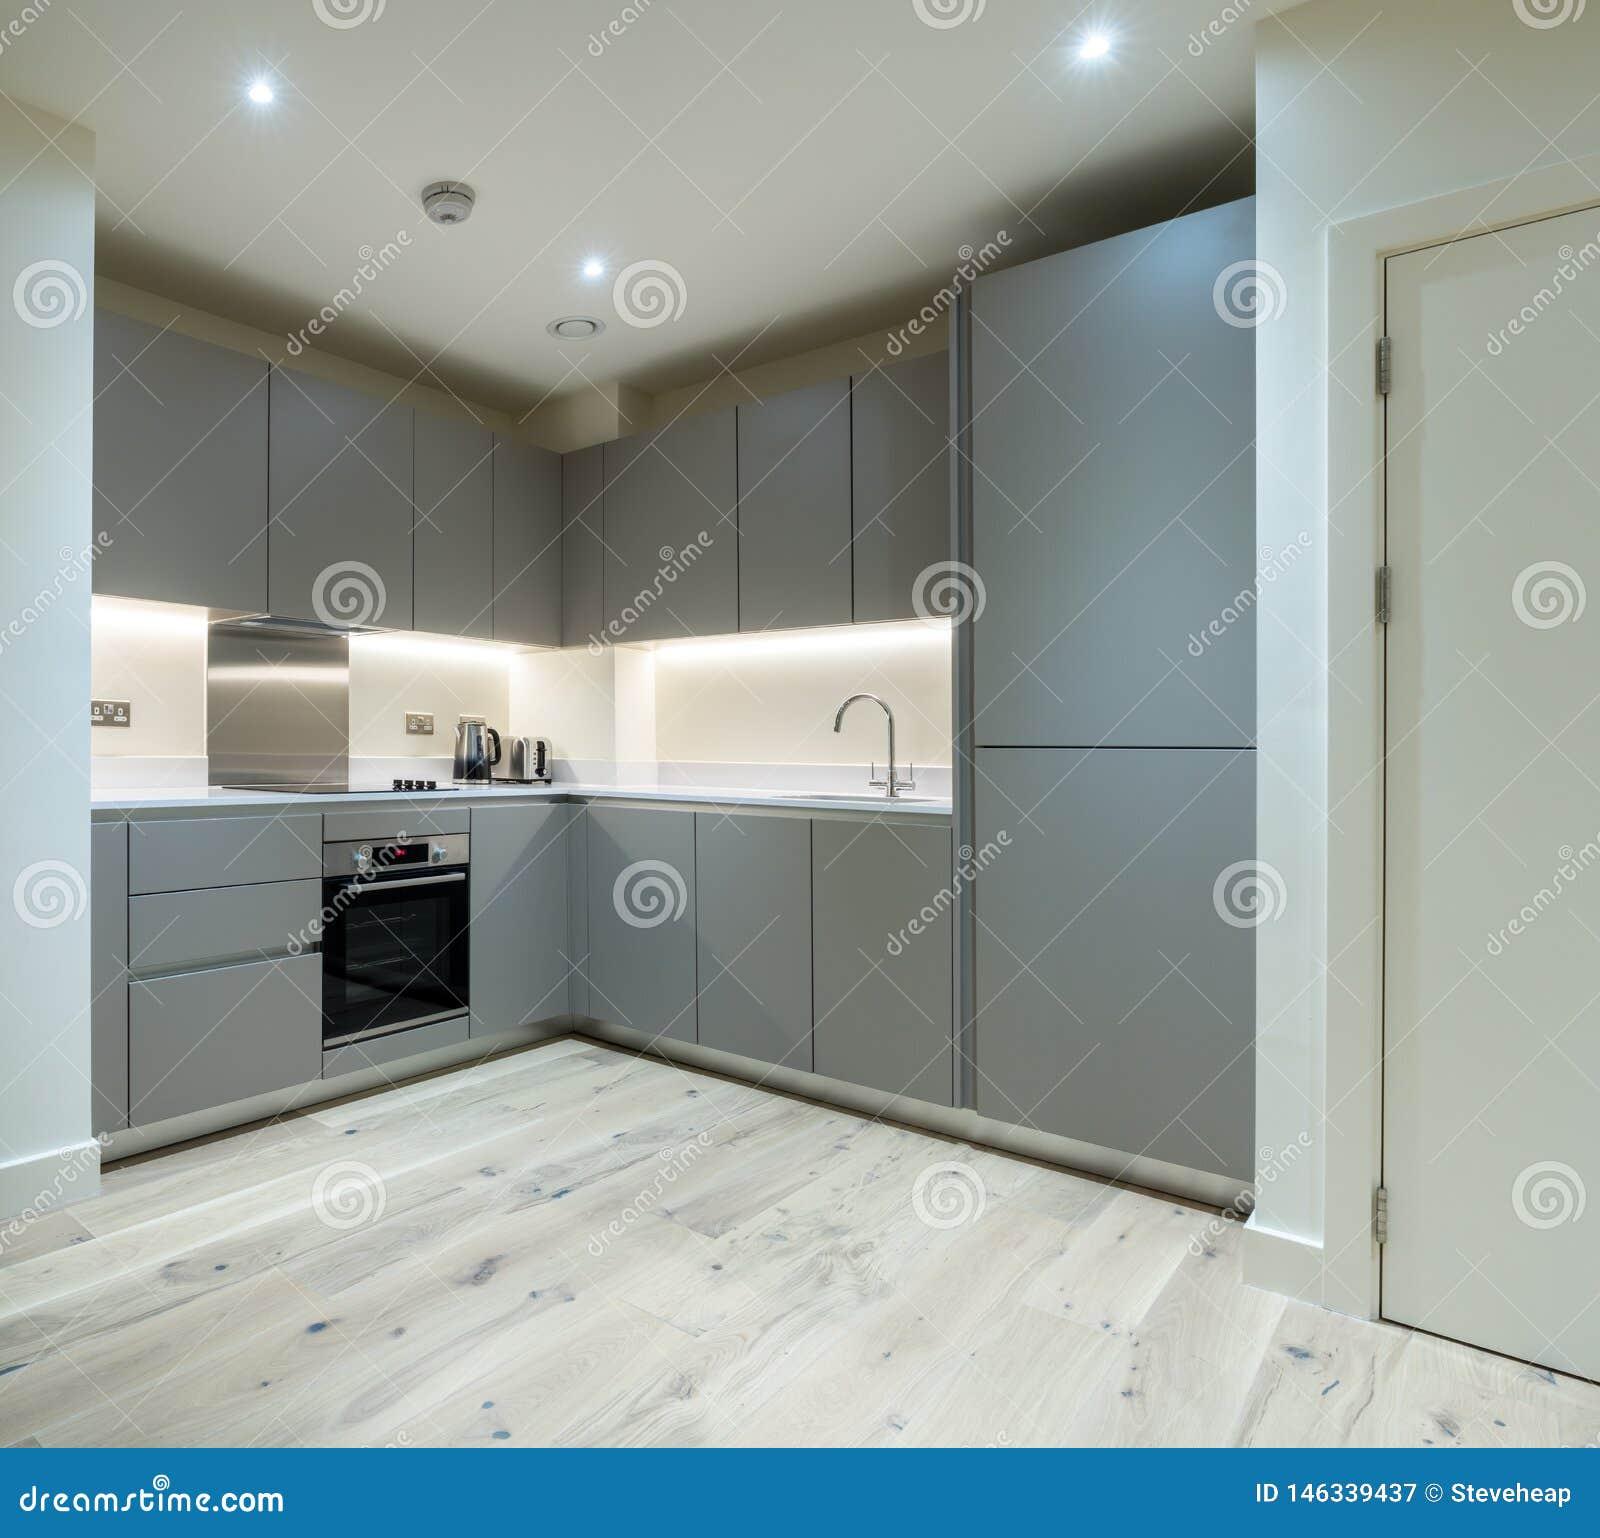 Modern Grey Built In Kitchen And Appliances In Modern ...